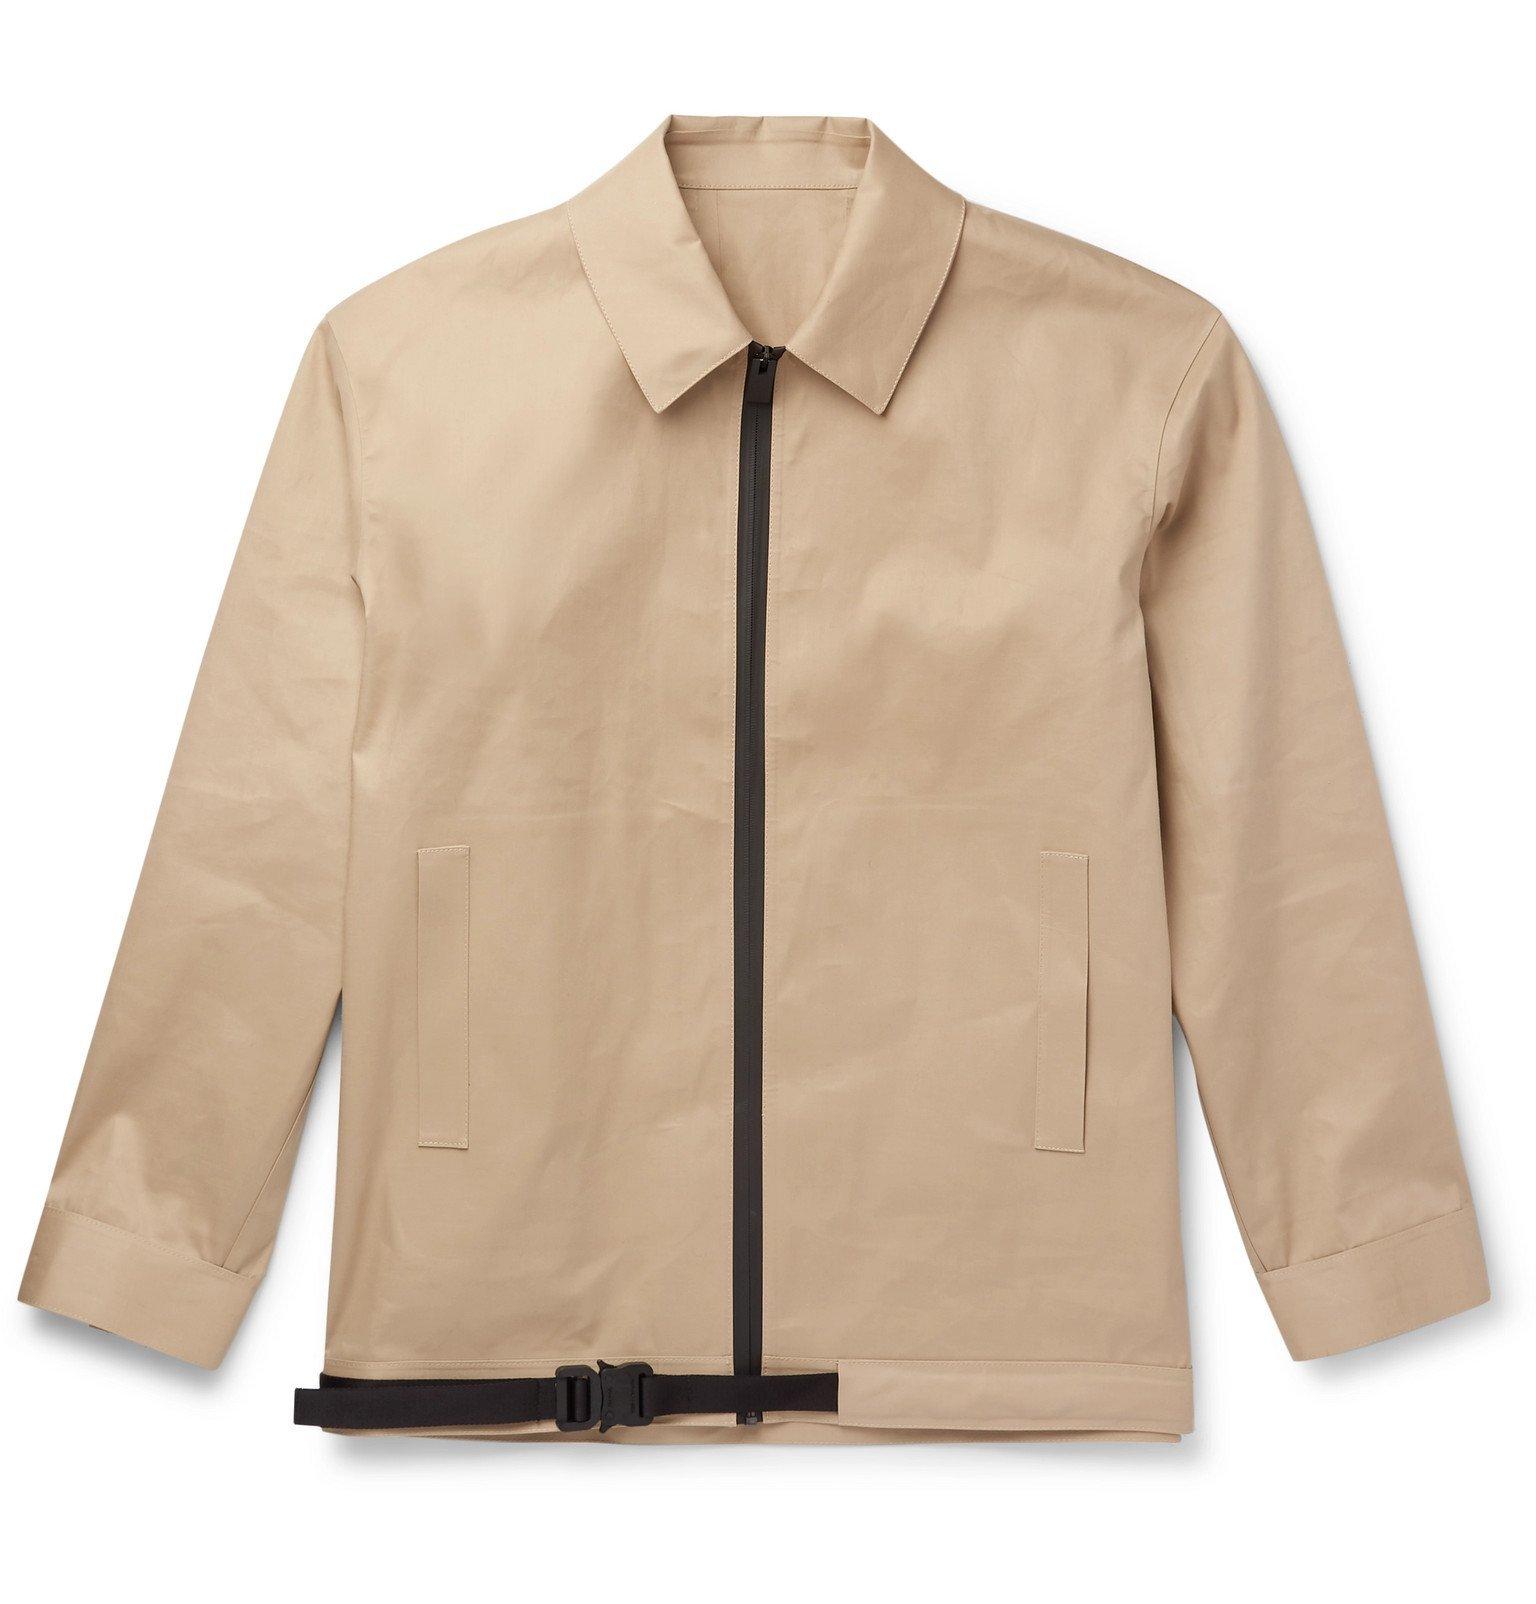 1017 ALYX 9SM - Mackintosh Bonded Cotton Jacket - Neutrals